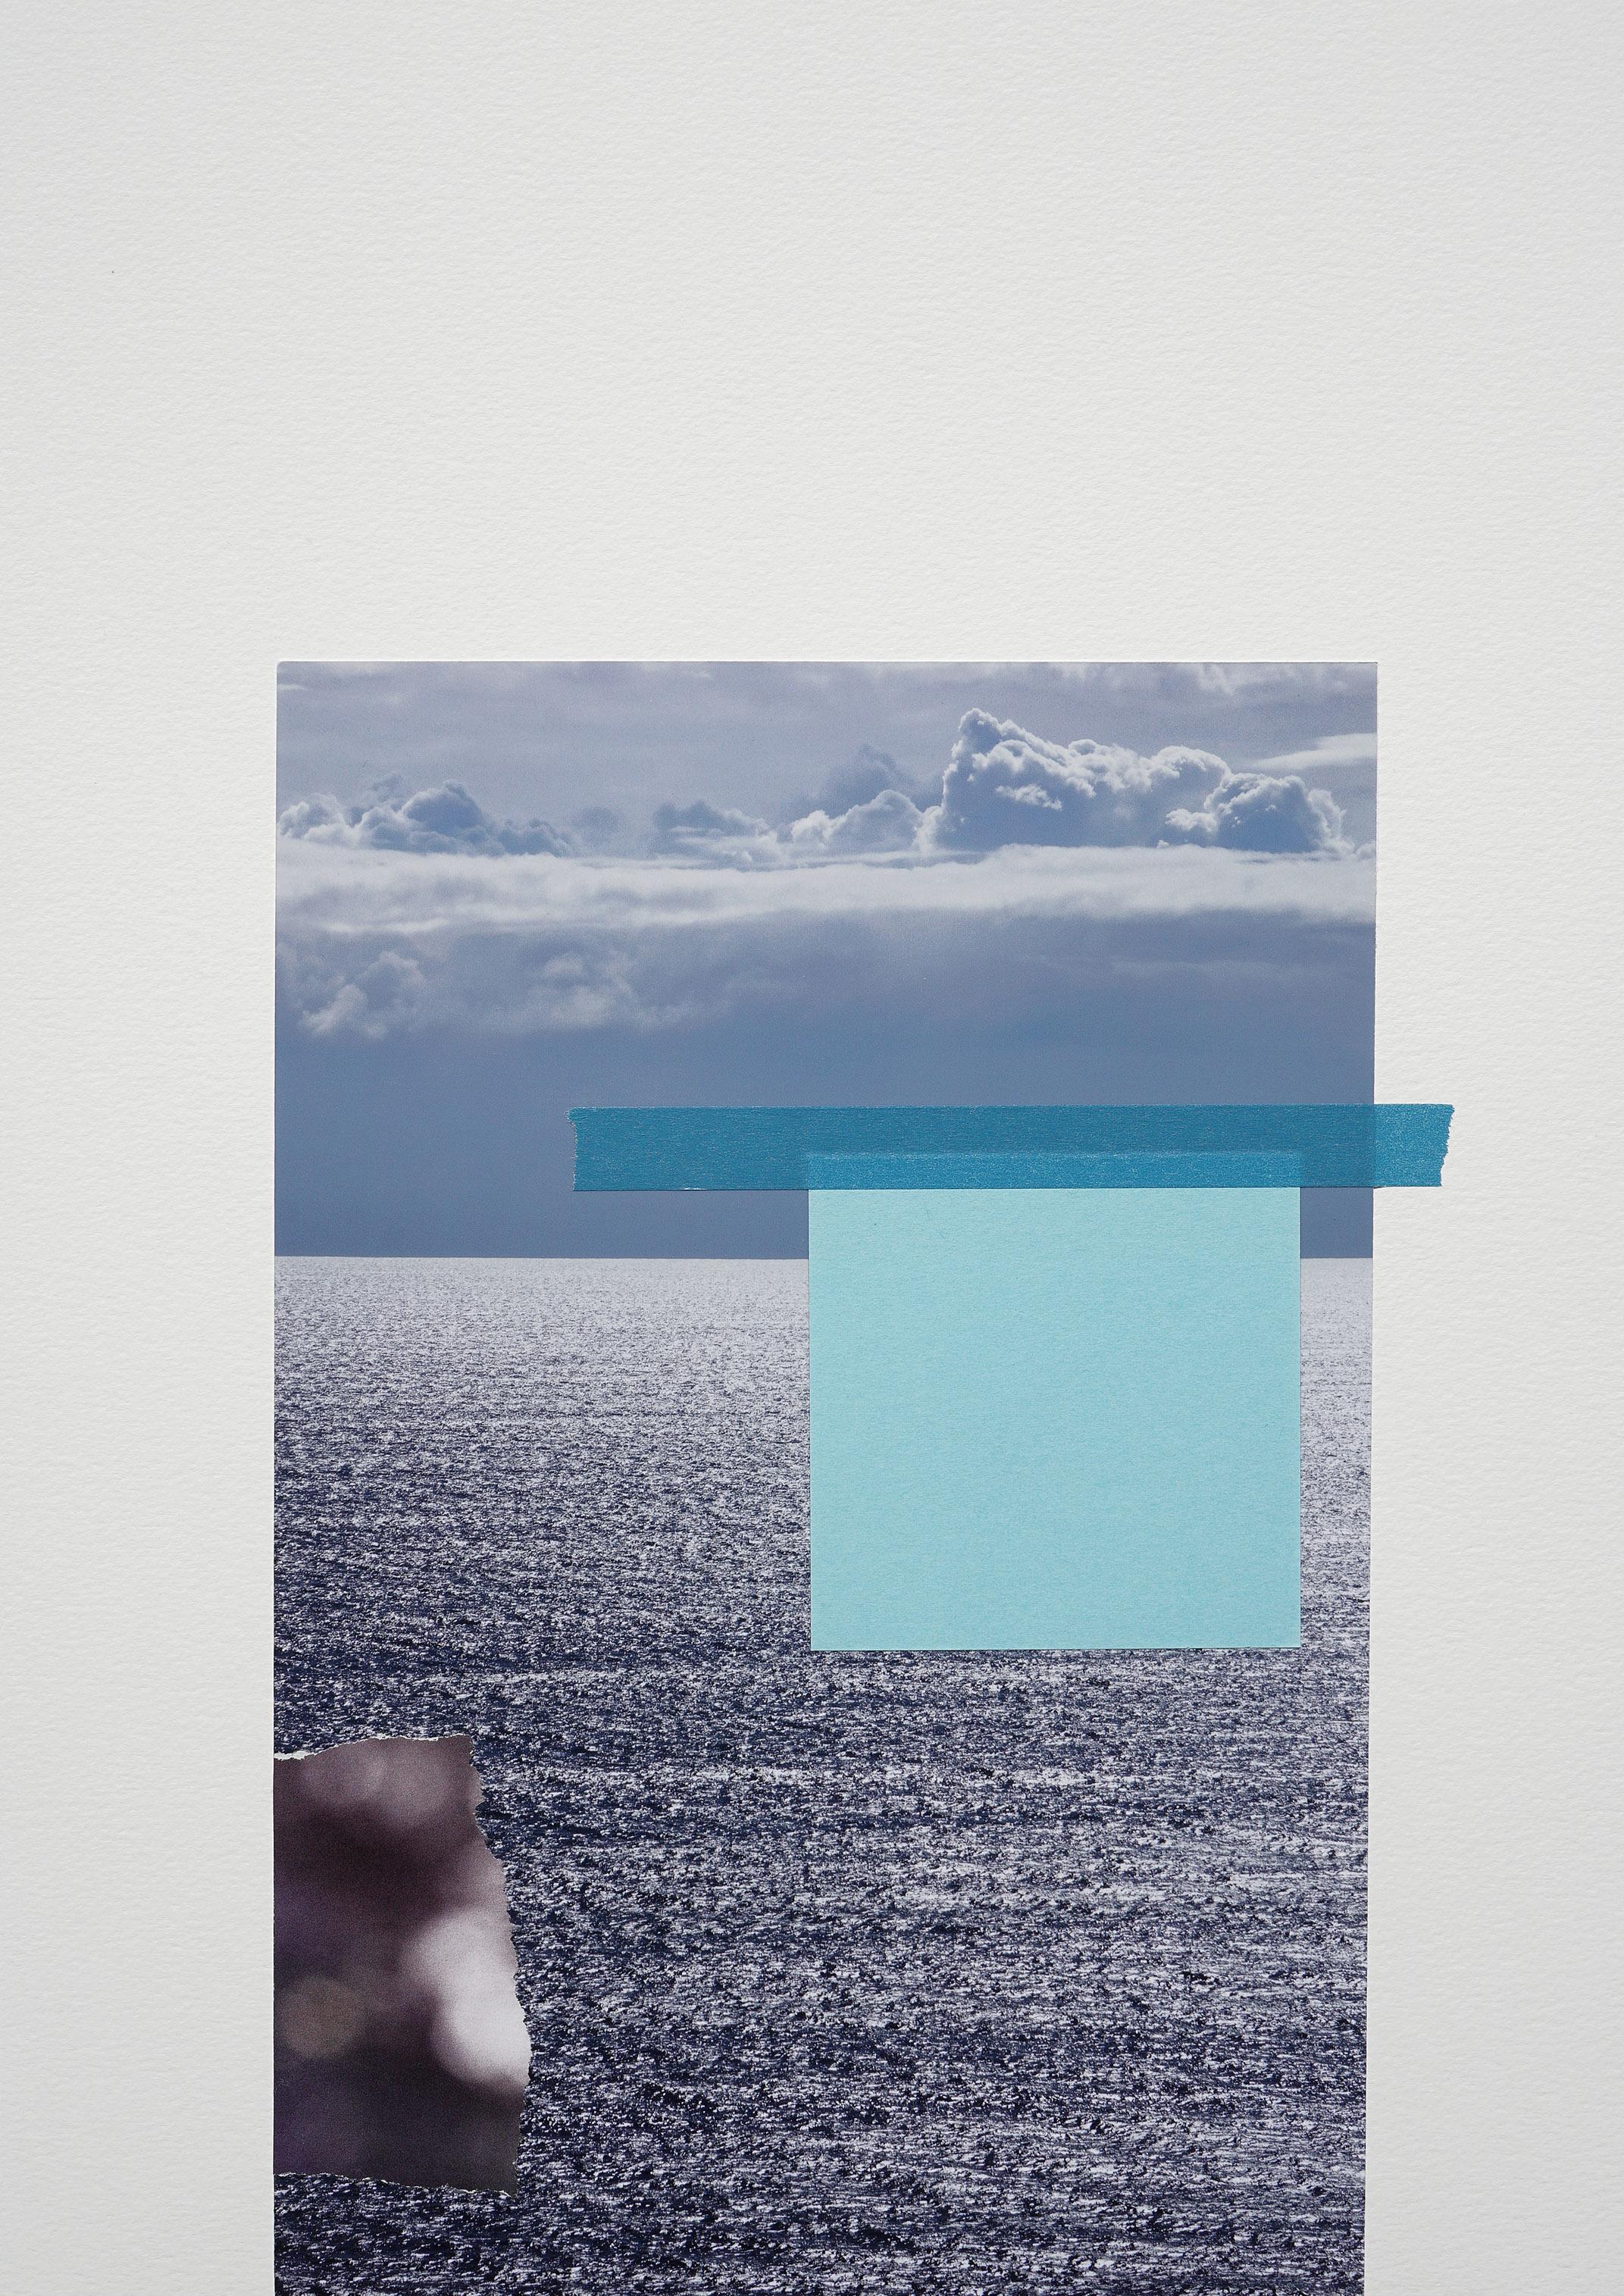 Jessica Backhaus New Horizon, 2017 Mixed-Media-Collage 42 x 30 cm, © Jessica Backhaus, VG Bild-Kunst, Bonn 2020, courtesy of the artist and Robert Morat Galerie, Berlin